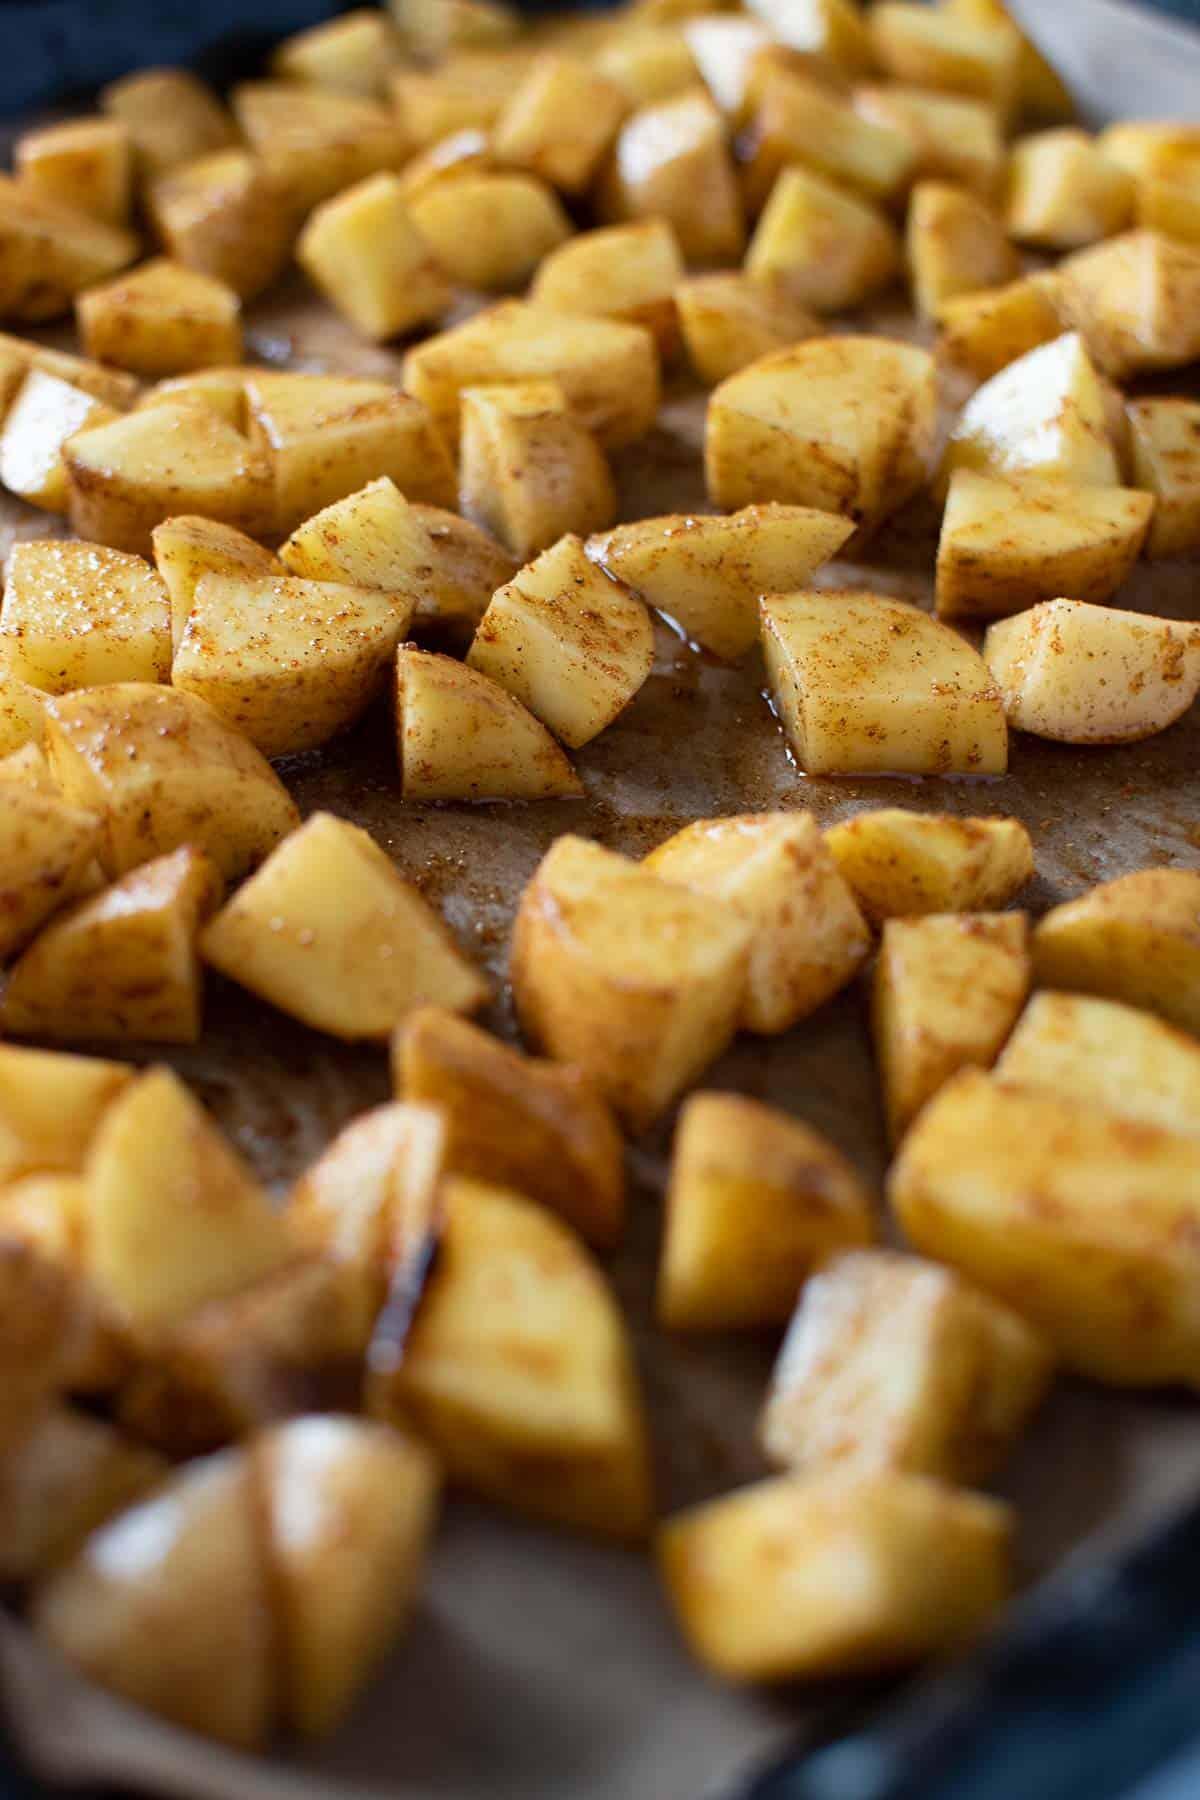 Seasoned diced potatoes on a sheet pan.